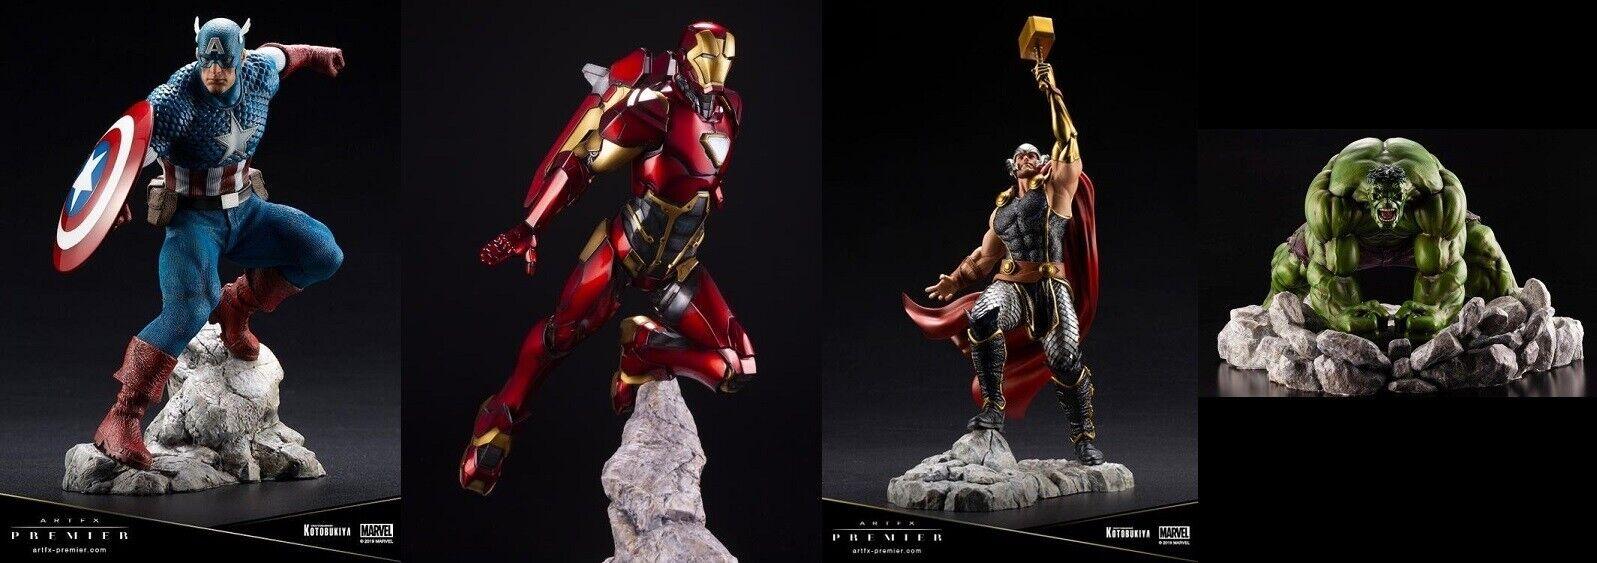 Kotobukiya Capitán América, Hulk, Iron Man, Thor 1 10 Artfx Premier conjunto pre-ordenar